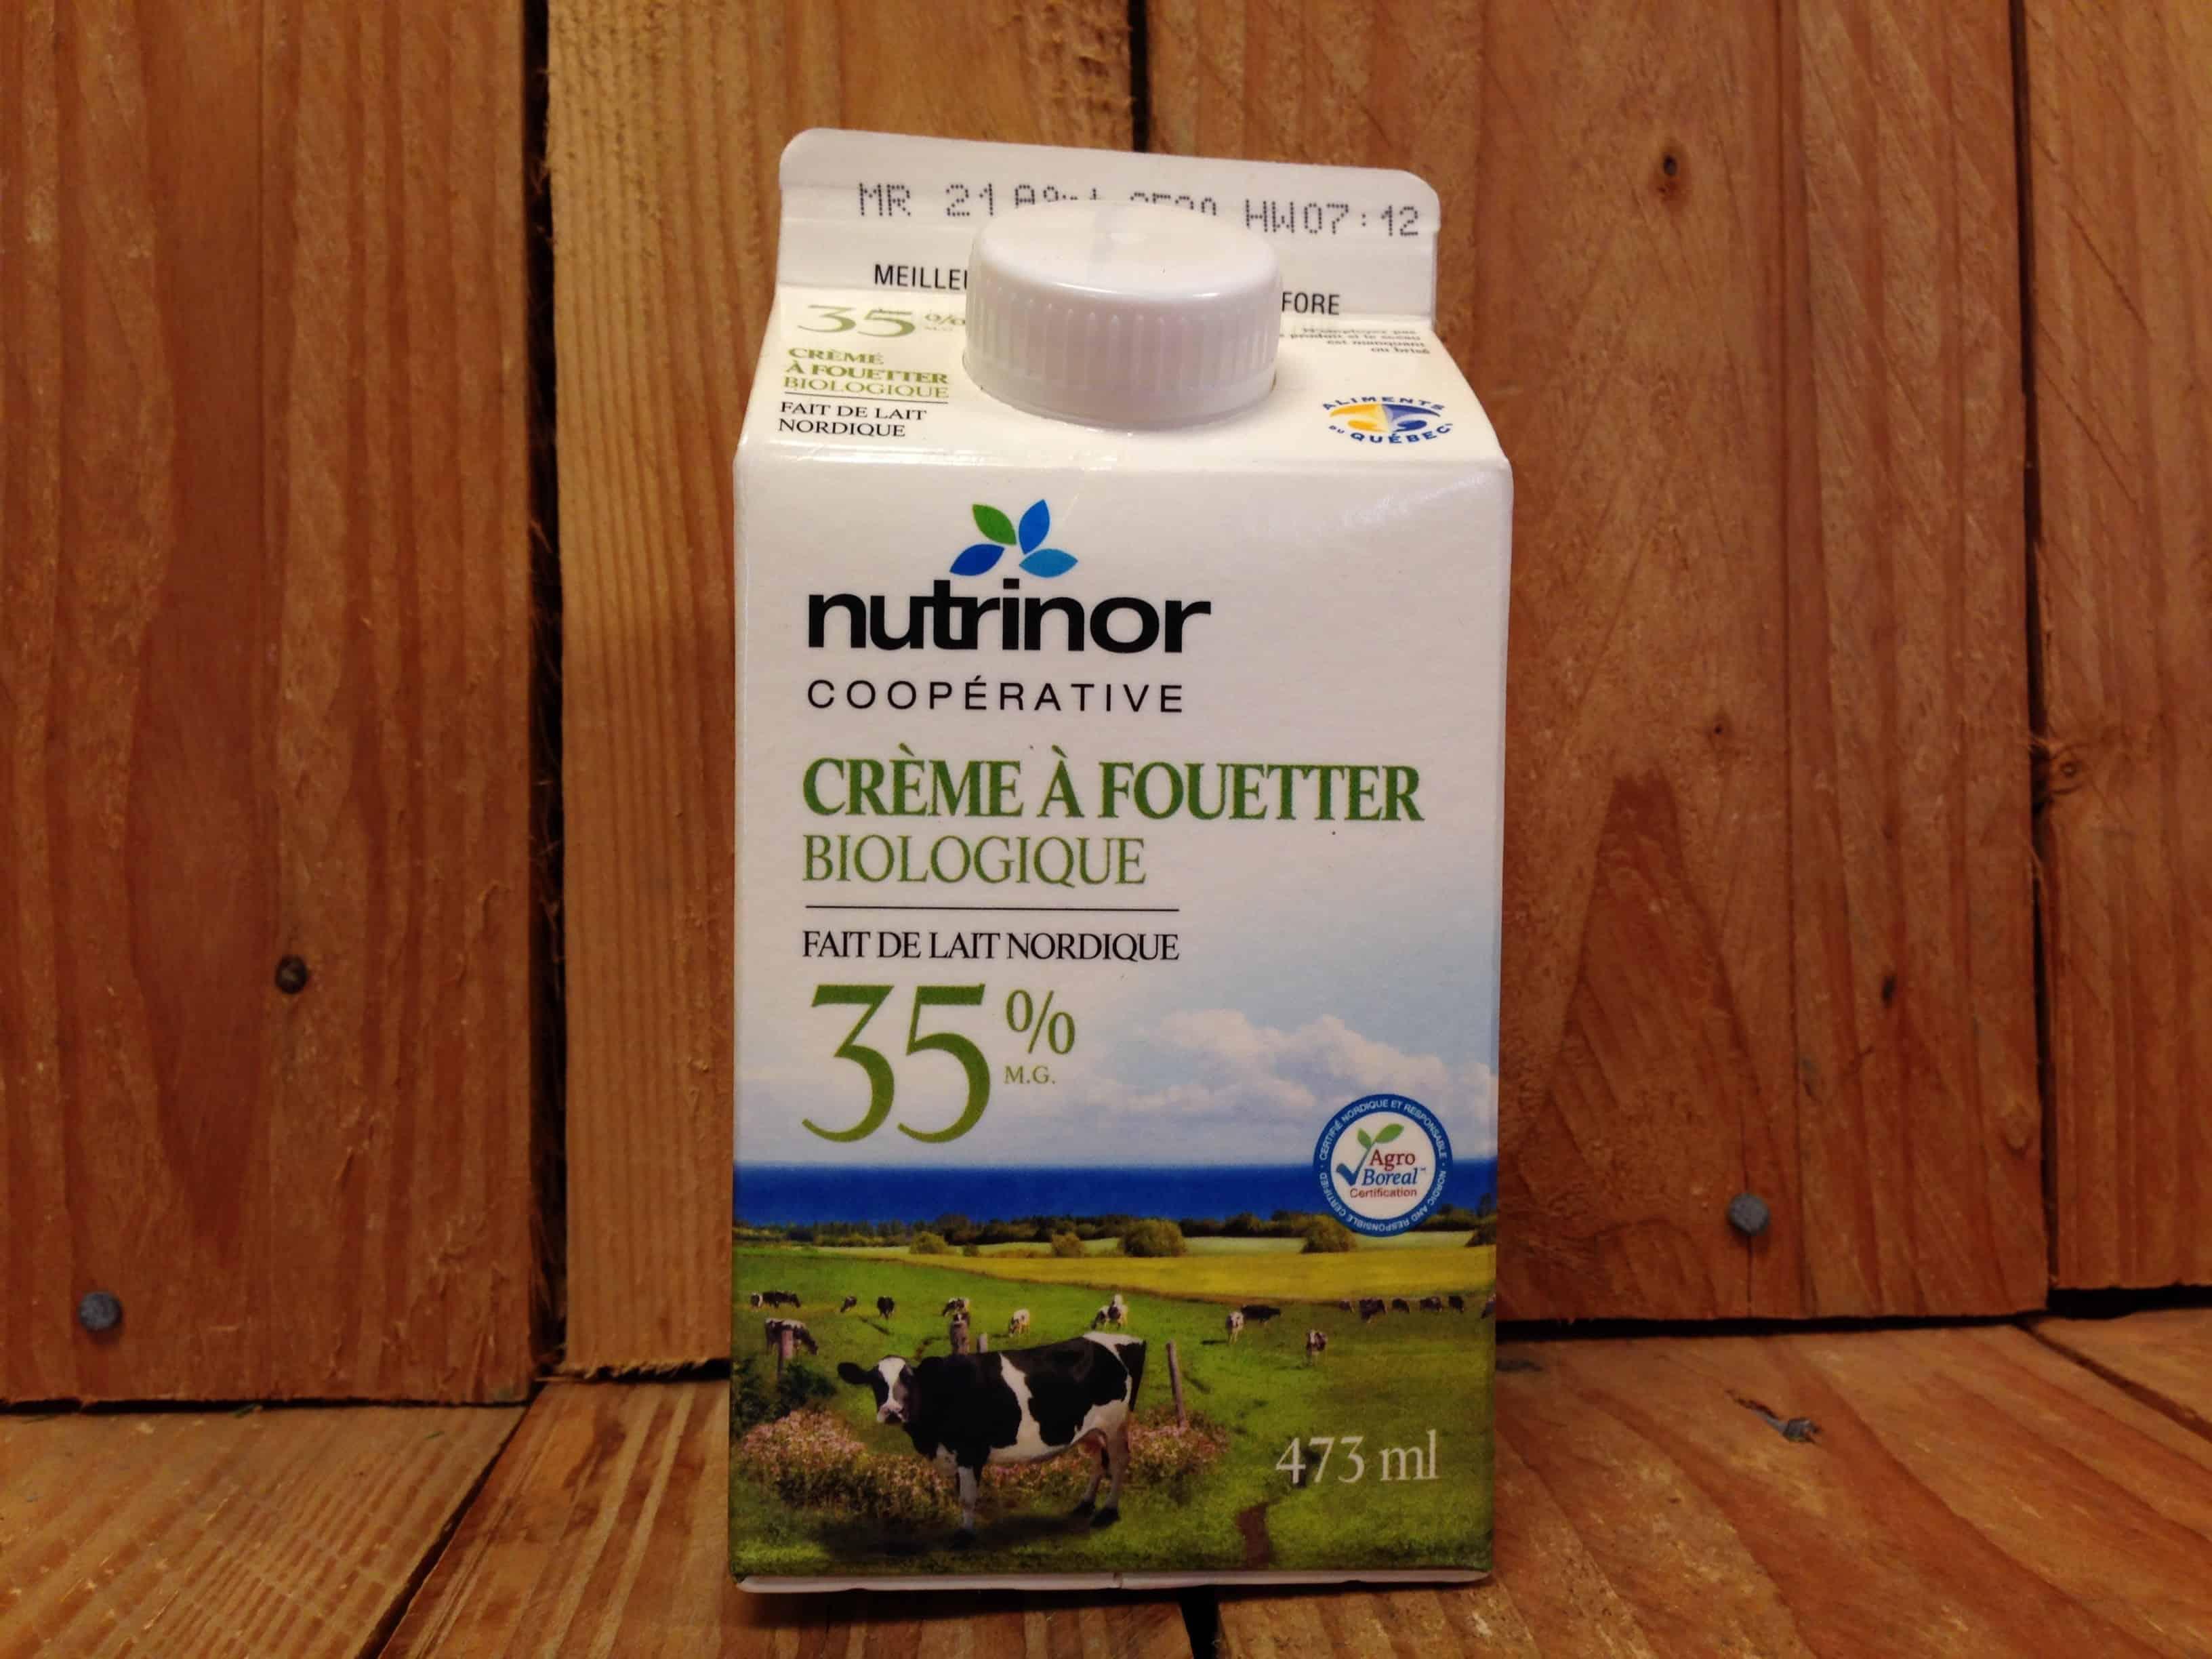 Nutrinor Cooperative – Organic Whipping Cream 35% (473ml)